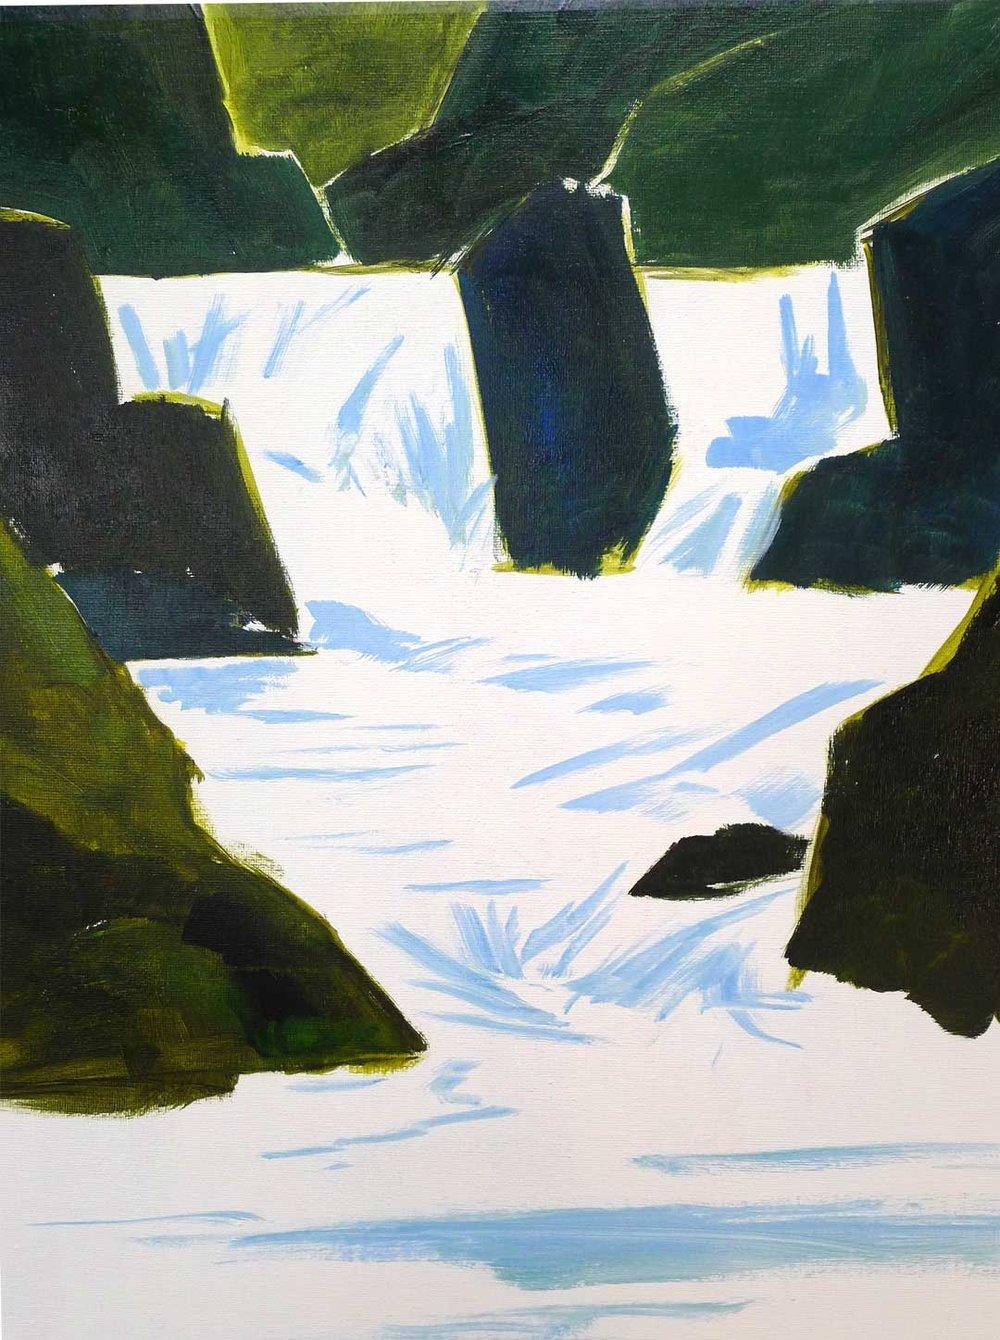 waterfall-paint-demo-3.jpg